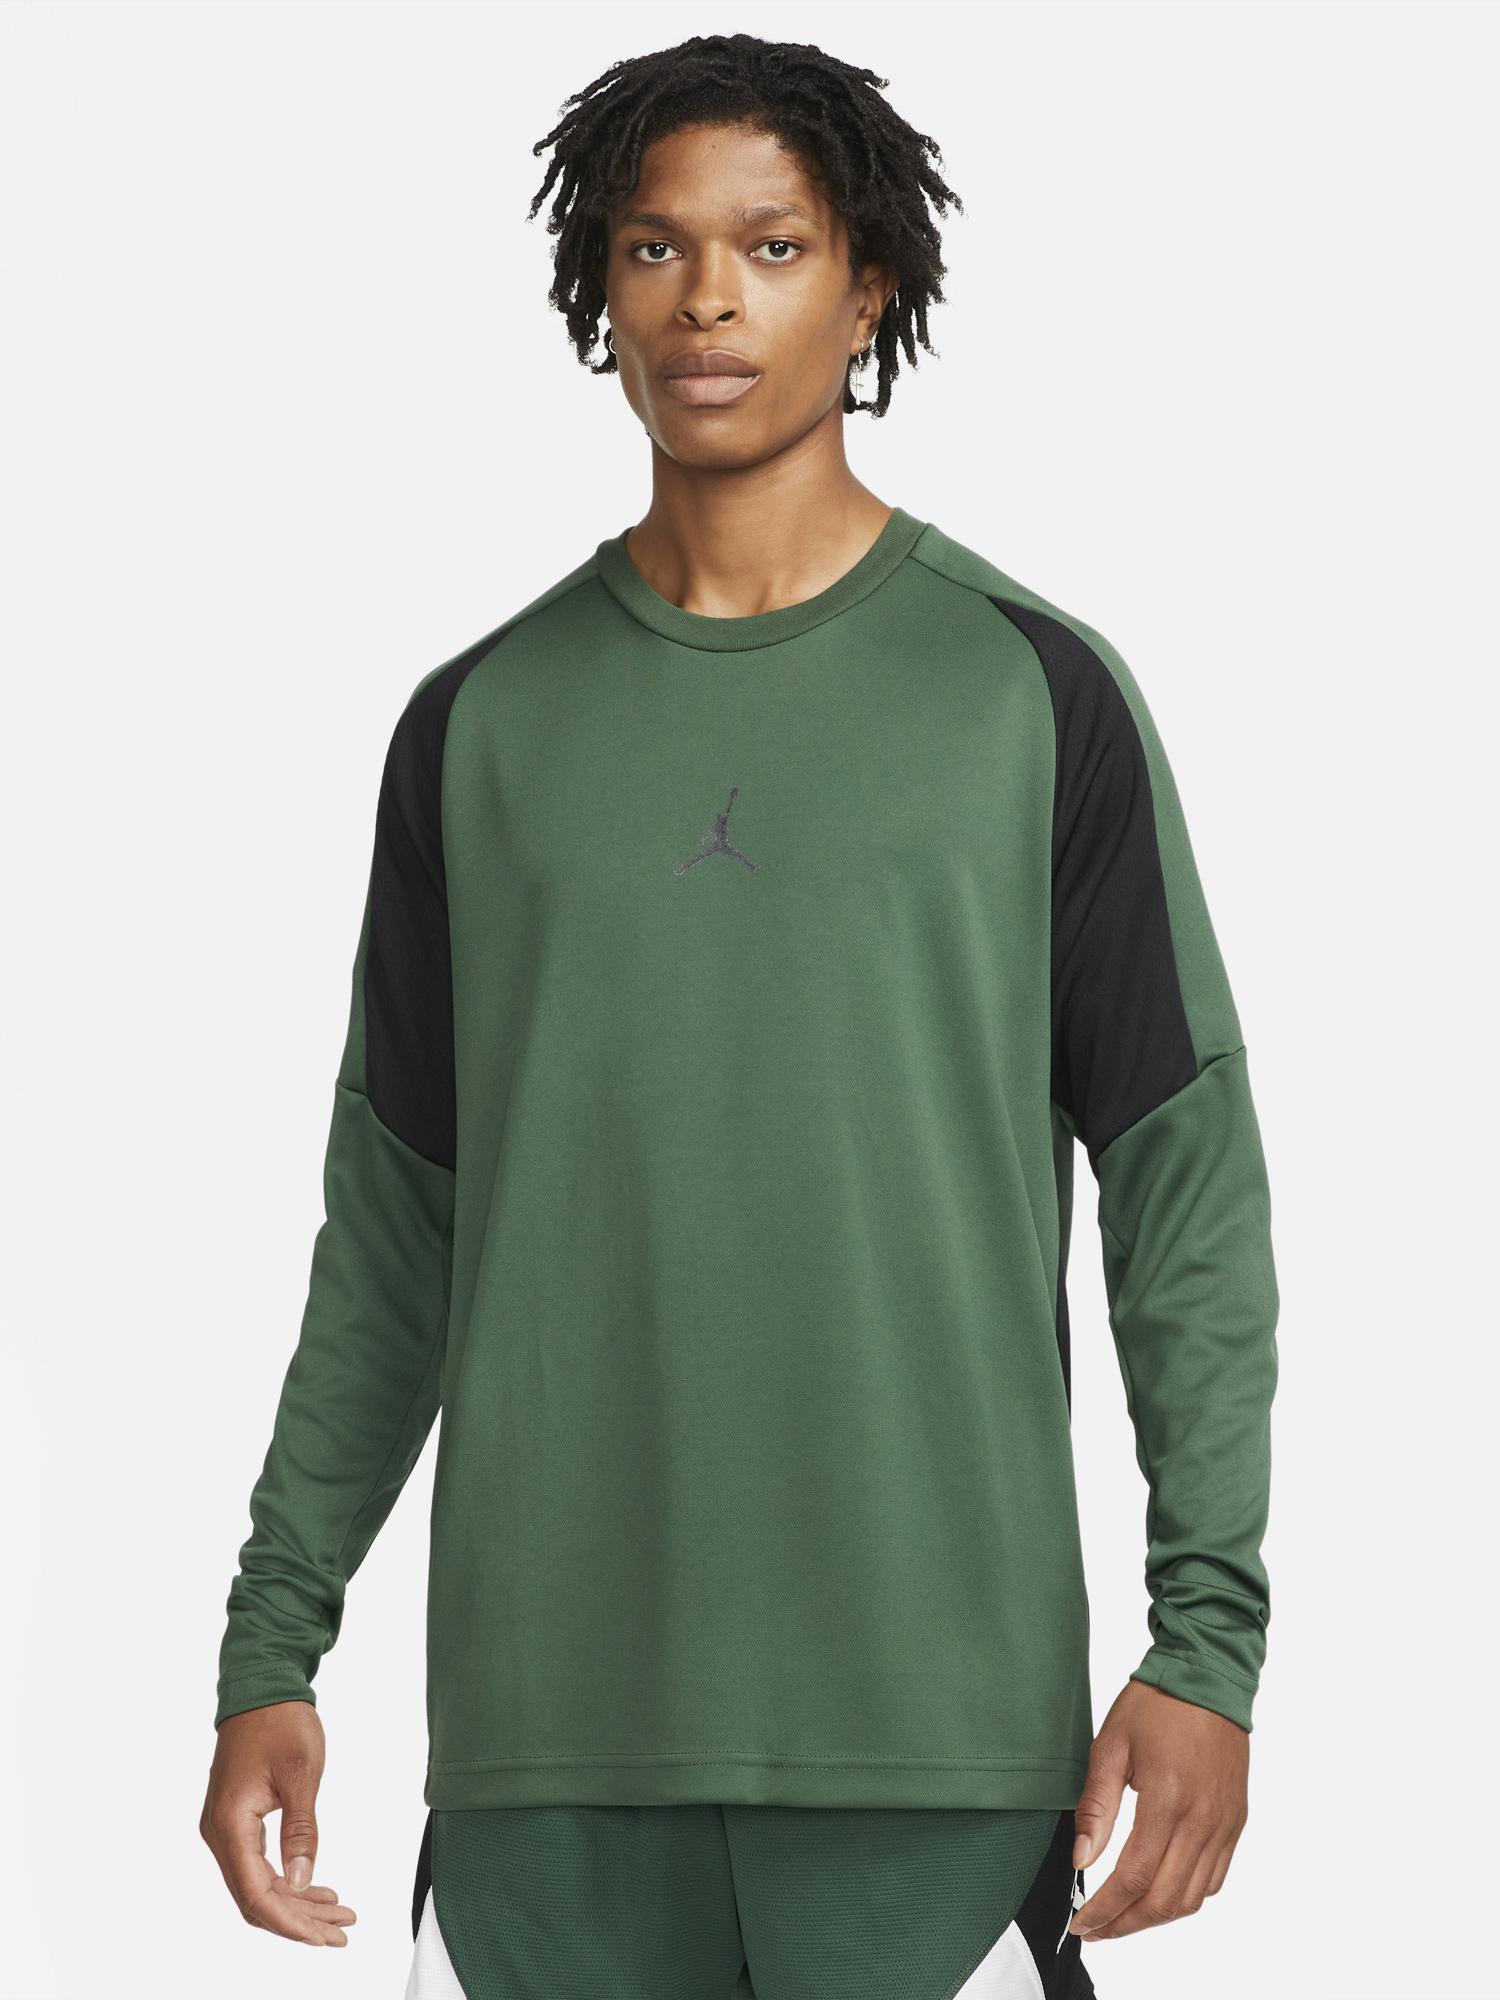 jordan-noble-green-statement-long-sleeve-shirt-1